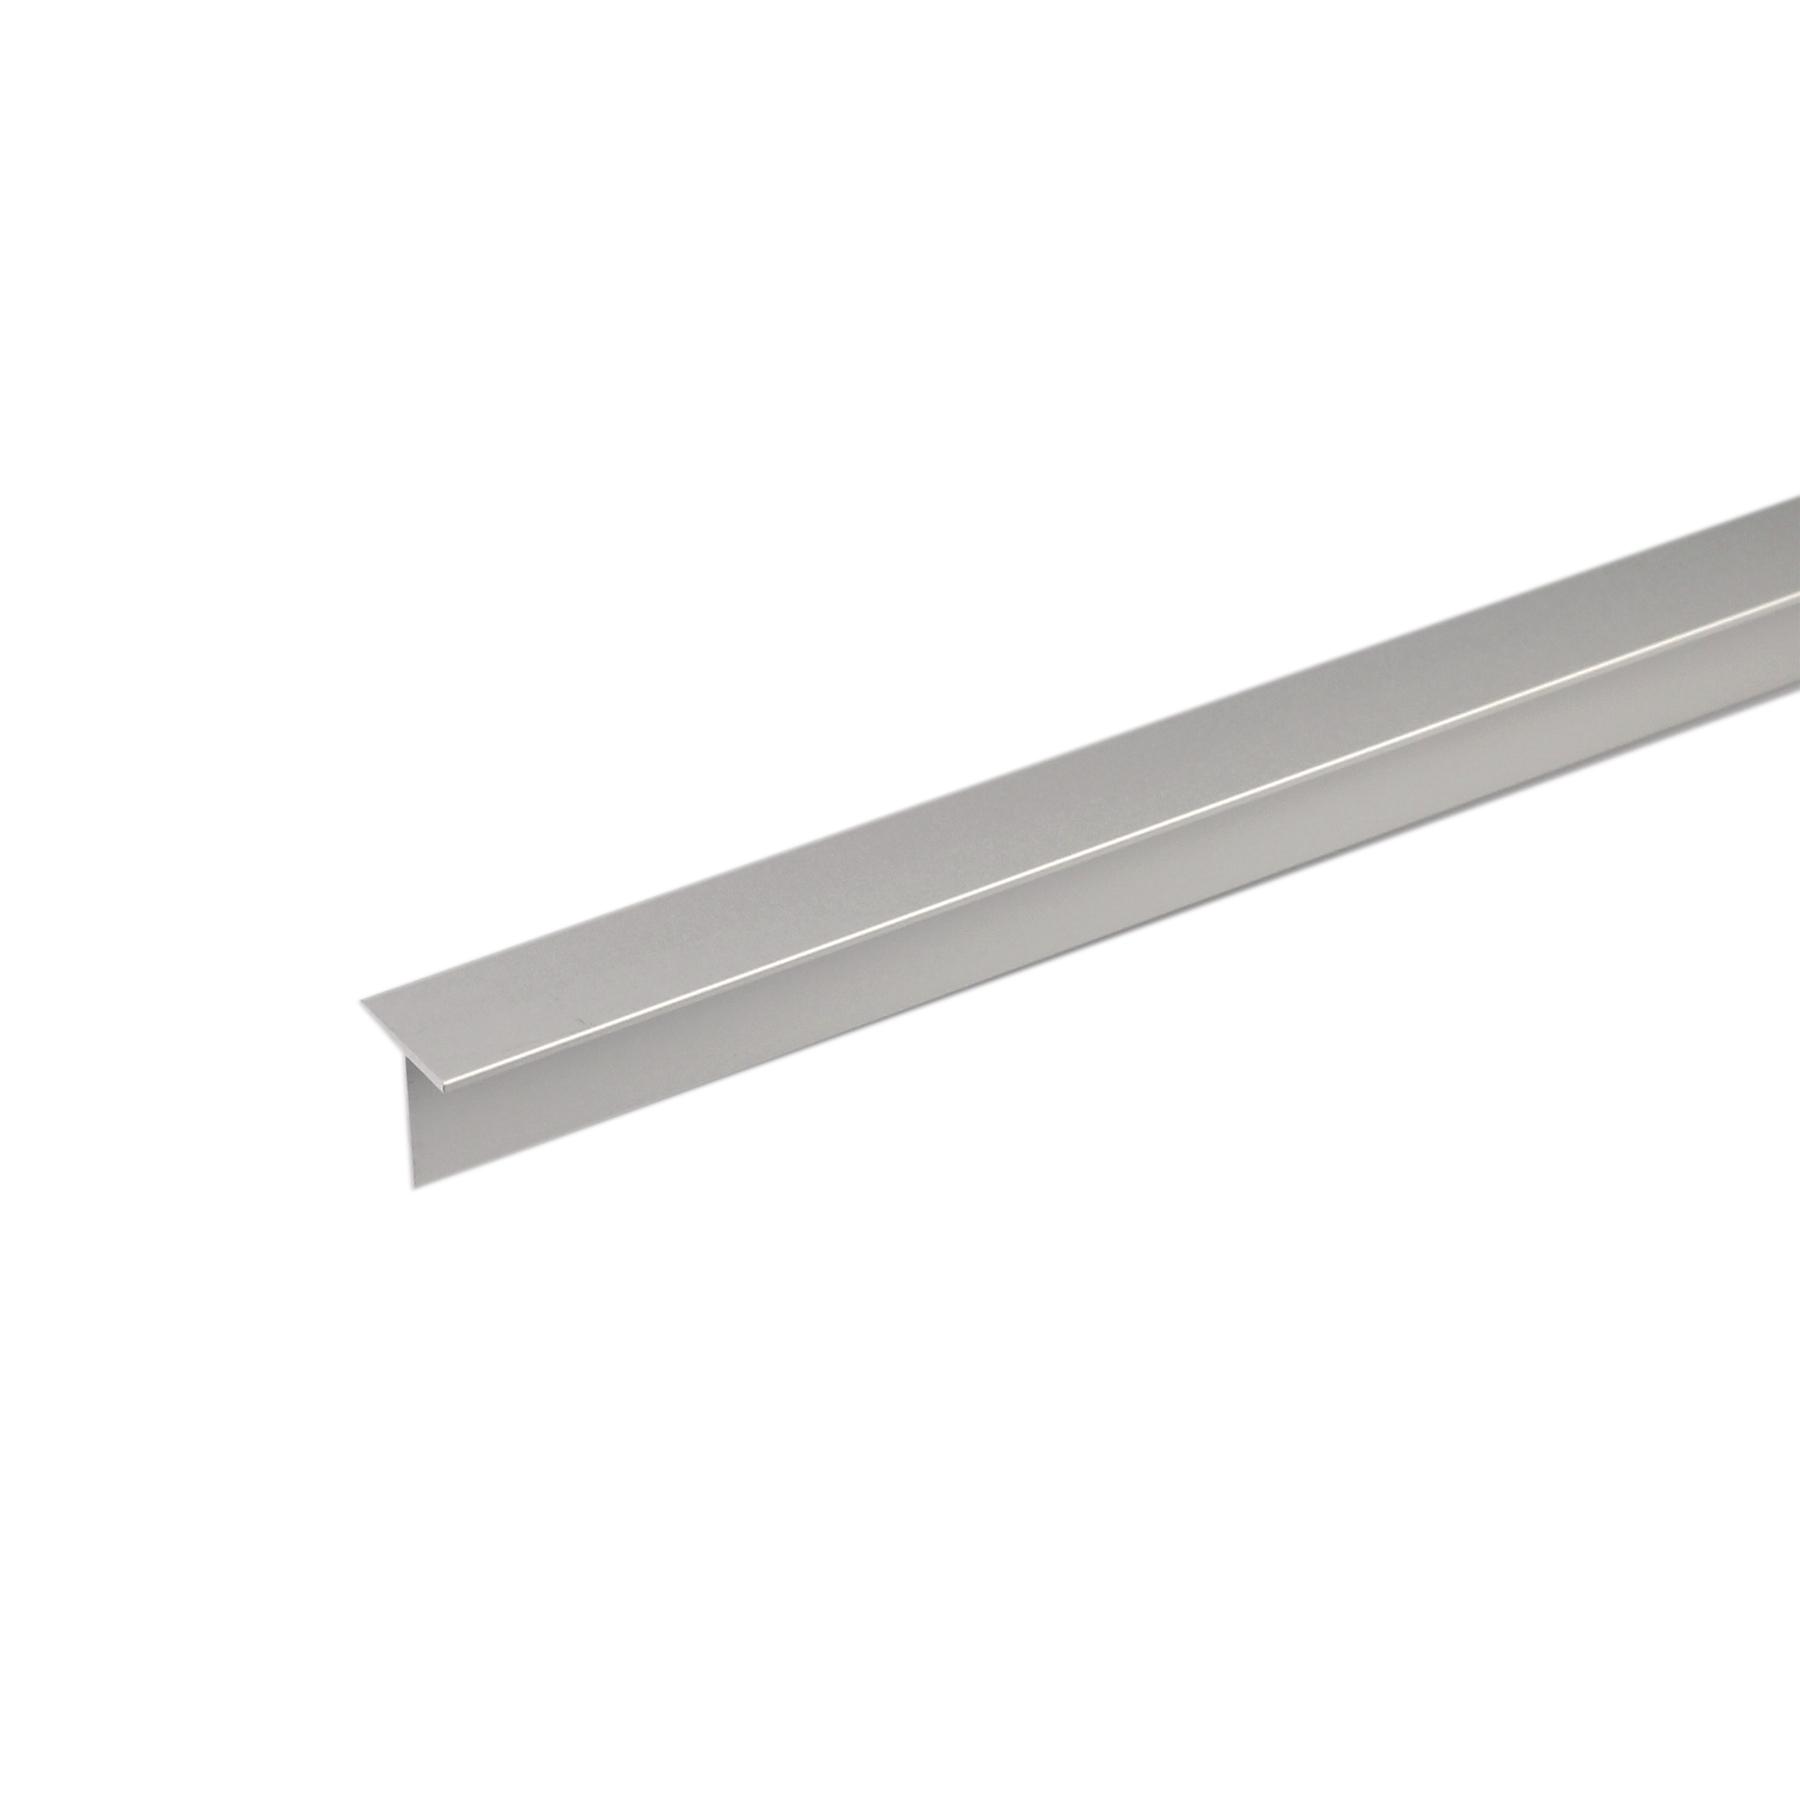 Perfil T Alumínio Anodizado 2mx15cm